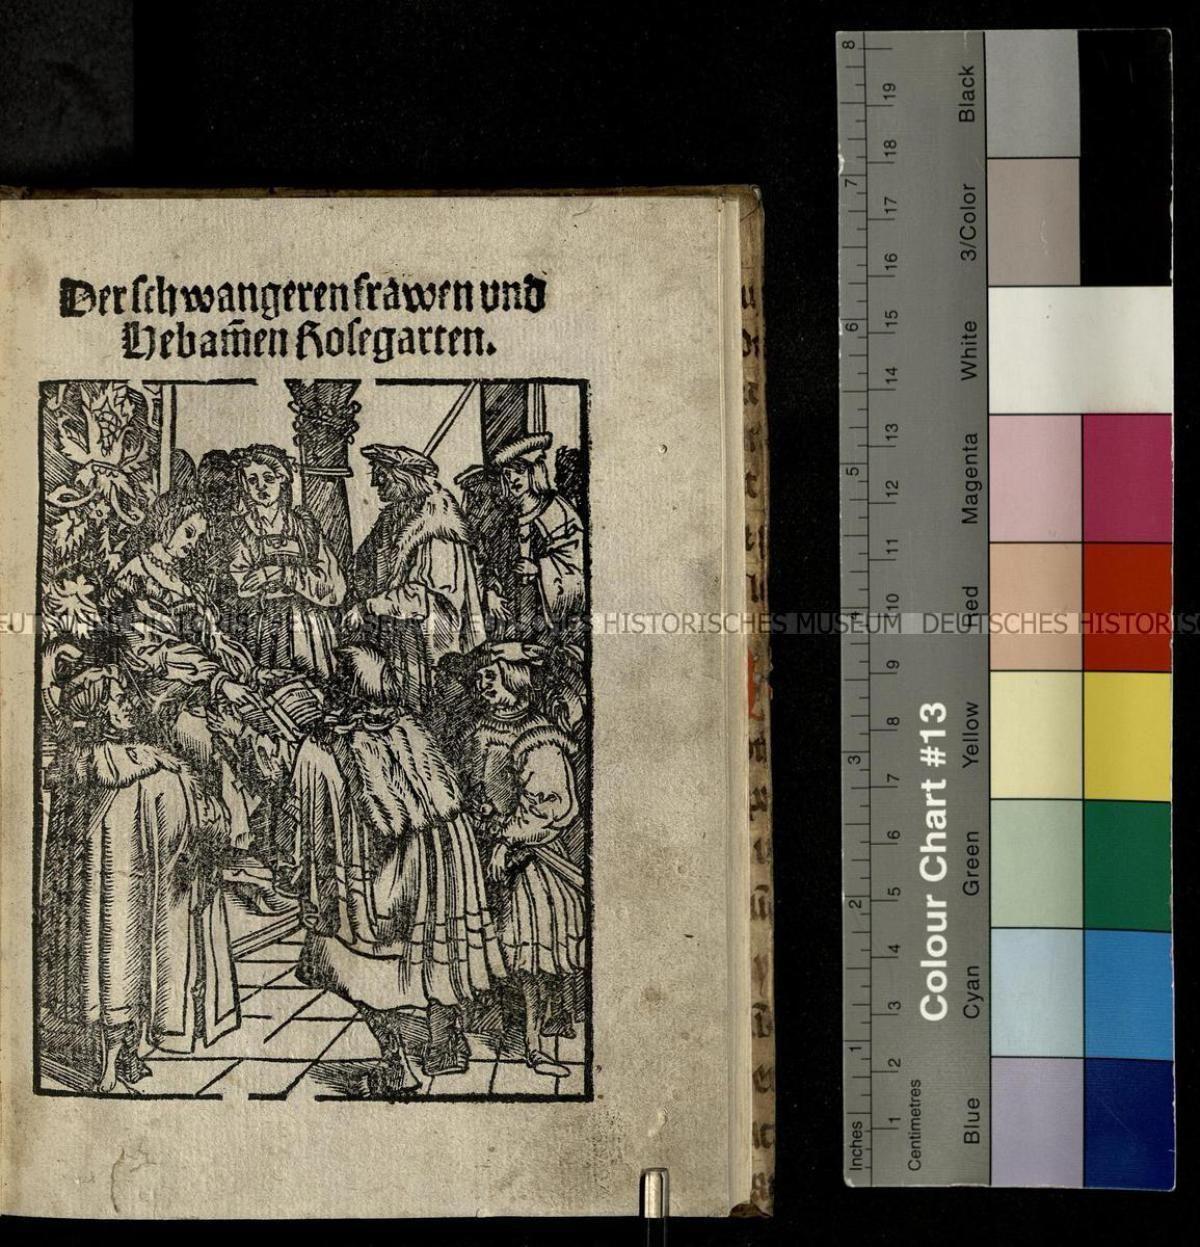 1522 Eucharius d.Ä. Rößlin: Der schwangeren frawen vnd Hebammen Rosegarten, Straßburg: Martin d.J. Flach,  [VD 16 R 2852] , Deutsches Historisches Museum